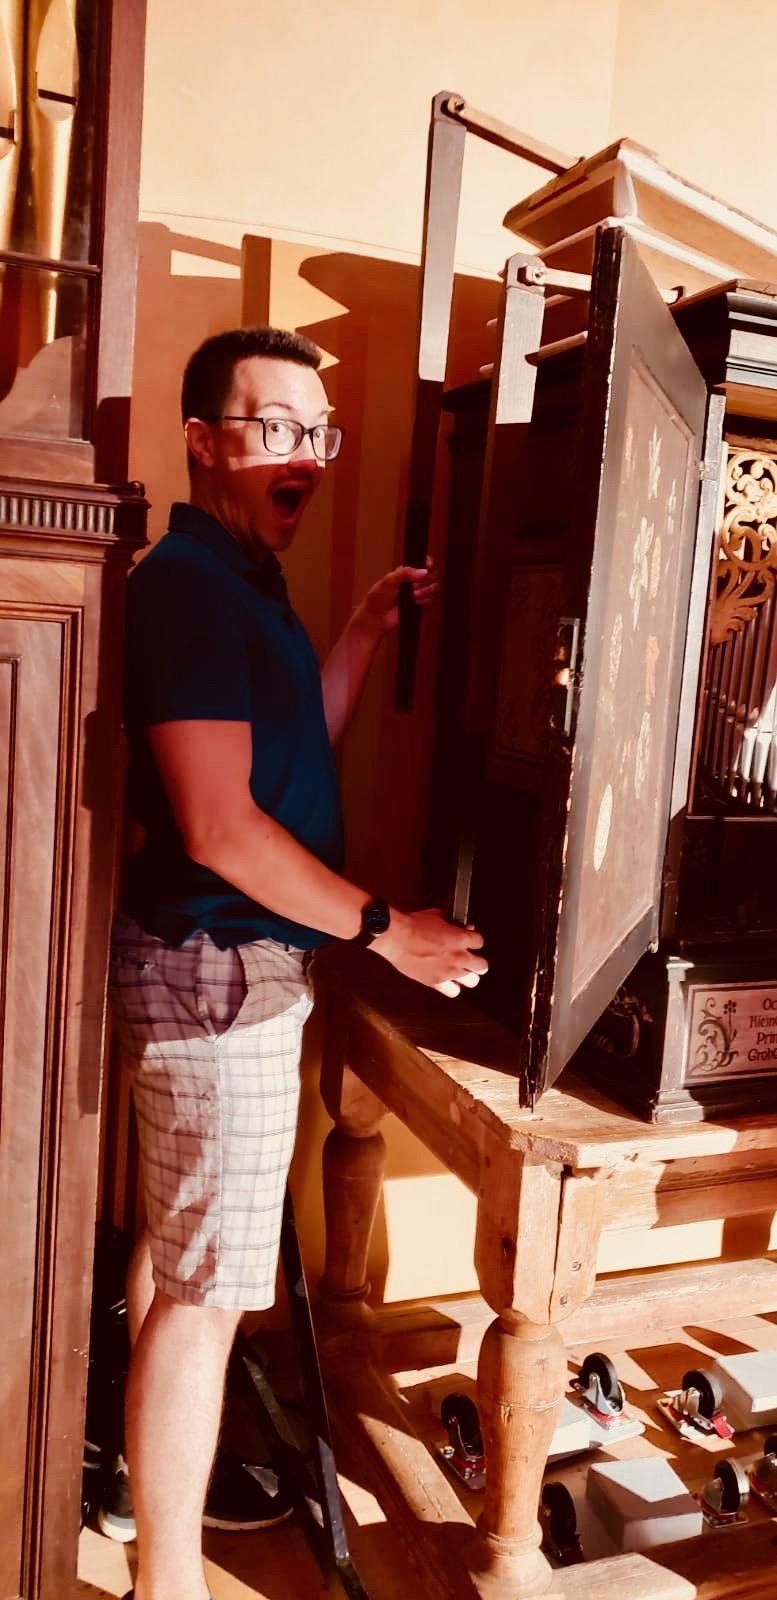 Corey De Tar pumps the bellows of the 17th-c organ in Göteborg University.